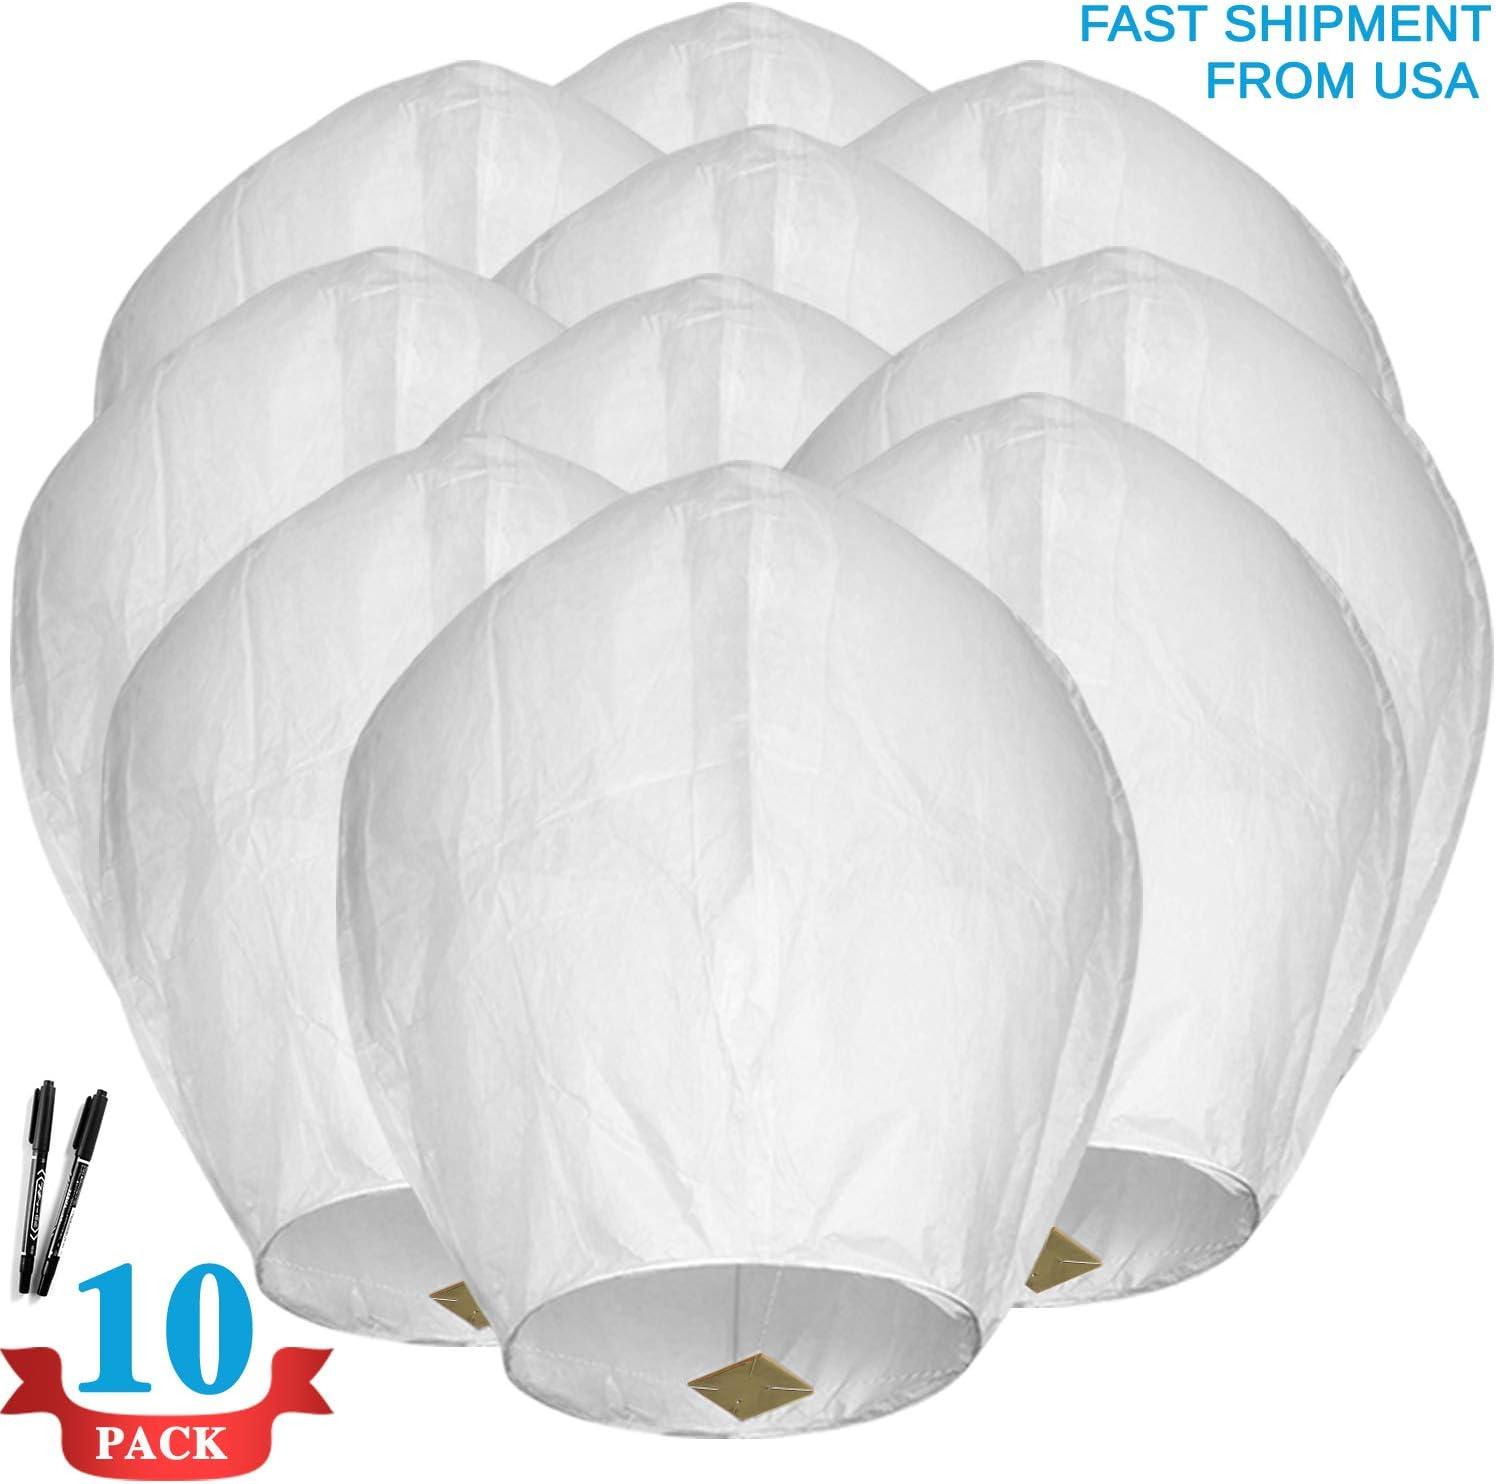 50 Paper Chinese Wish Lantern Sky lantern Party Wedding US Seller fast shipping